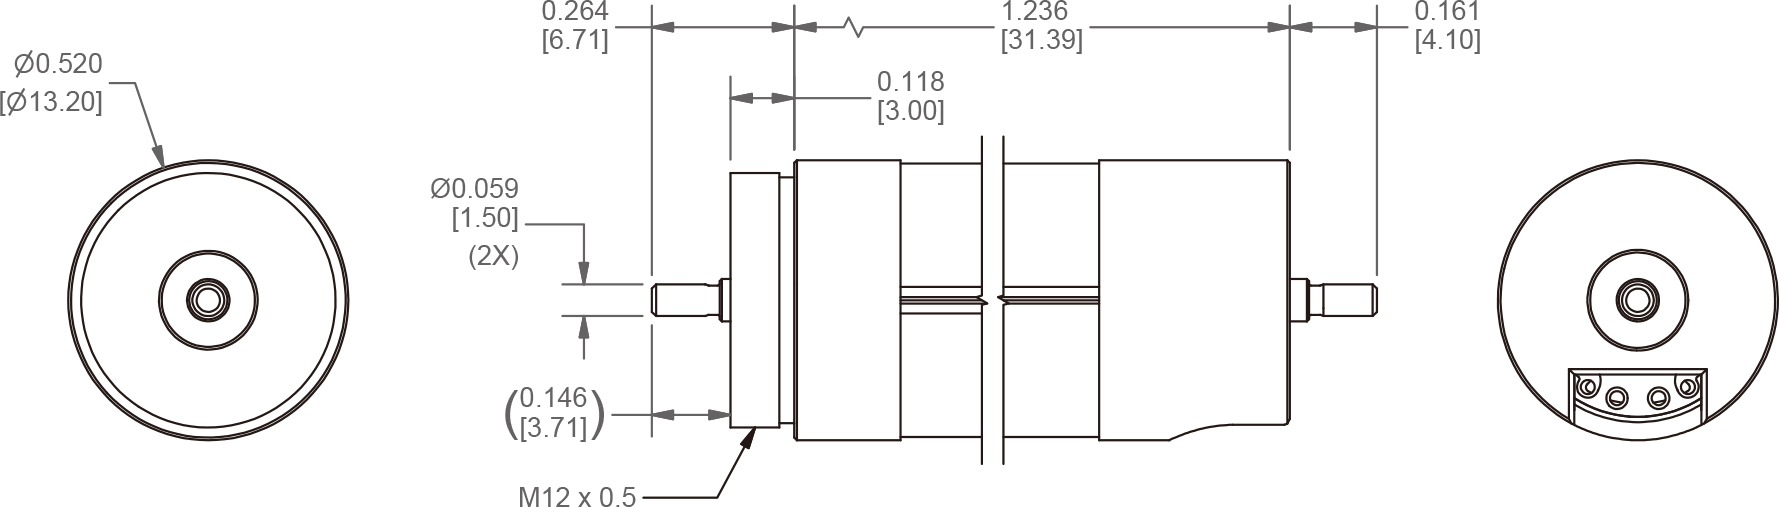 PT106 dimensions